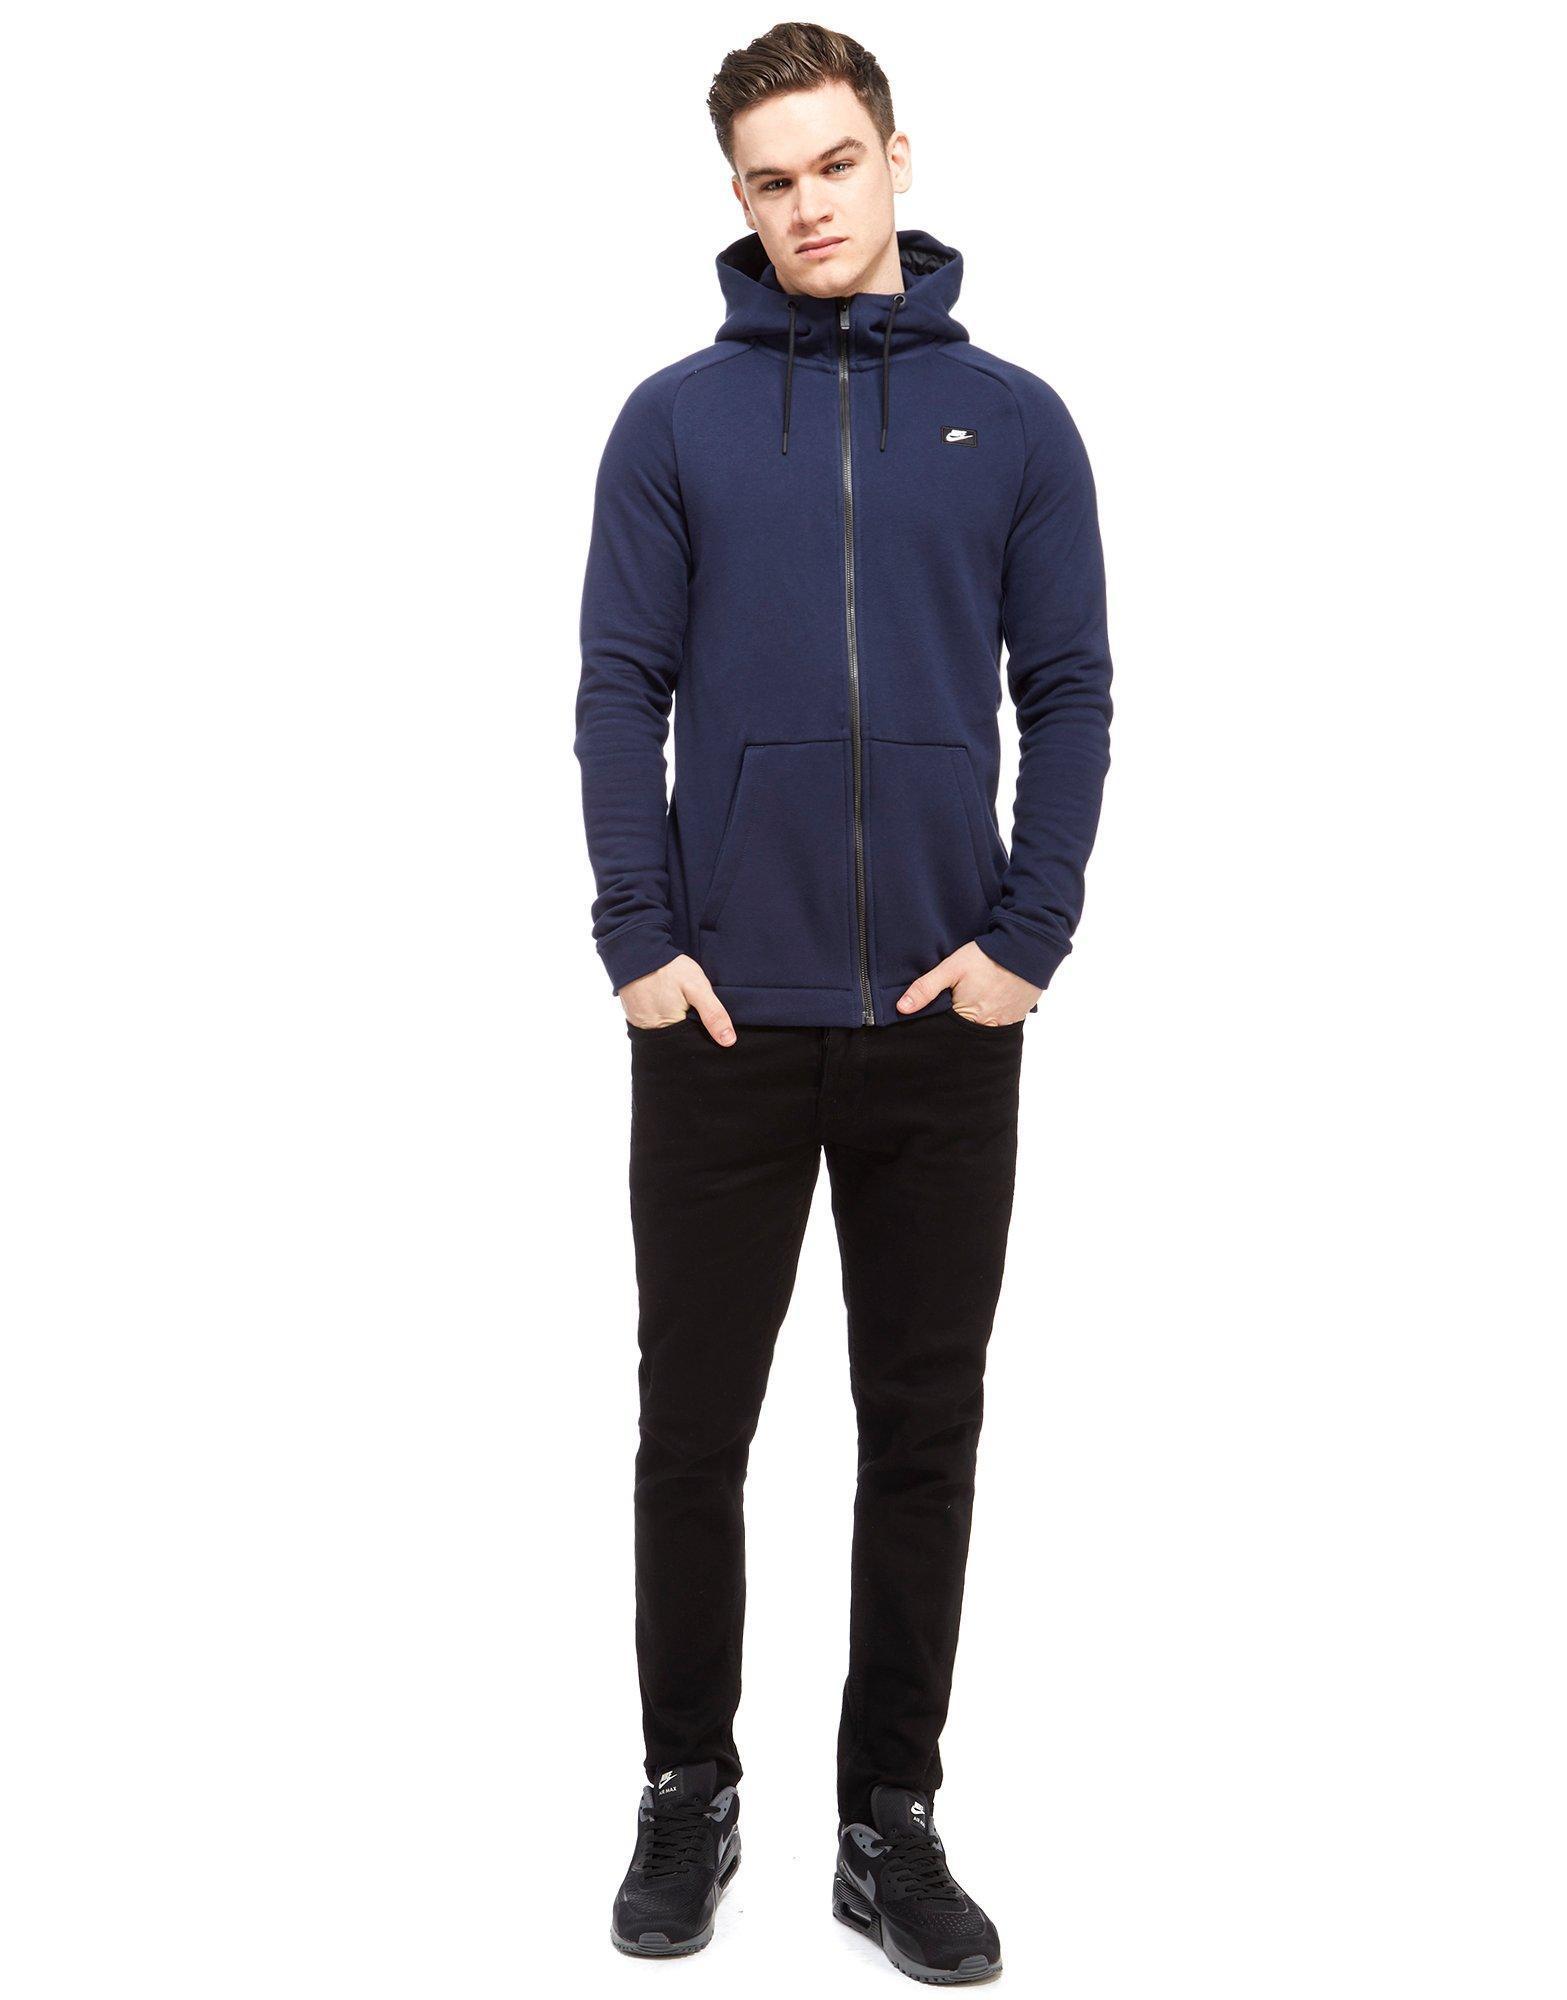 Nike Cotton Modern Hoody in Navy (Blue) for Men